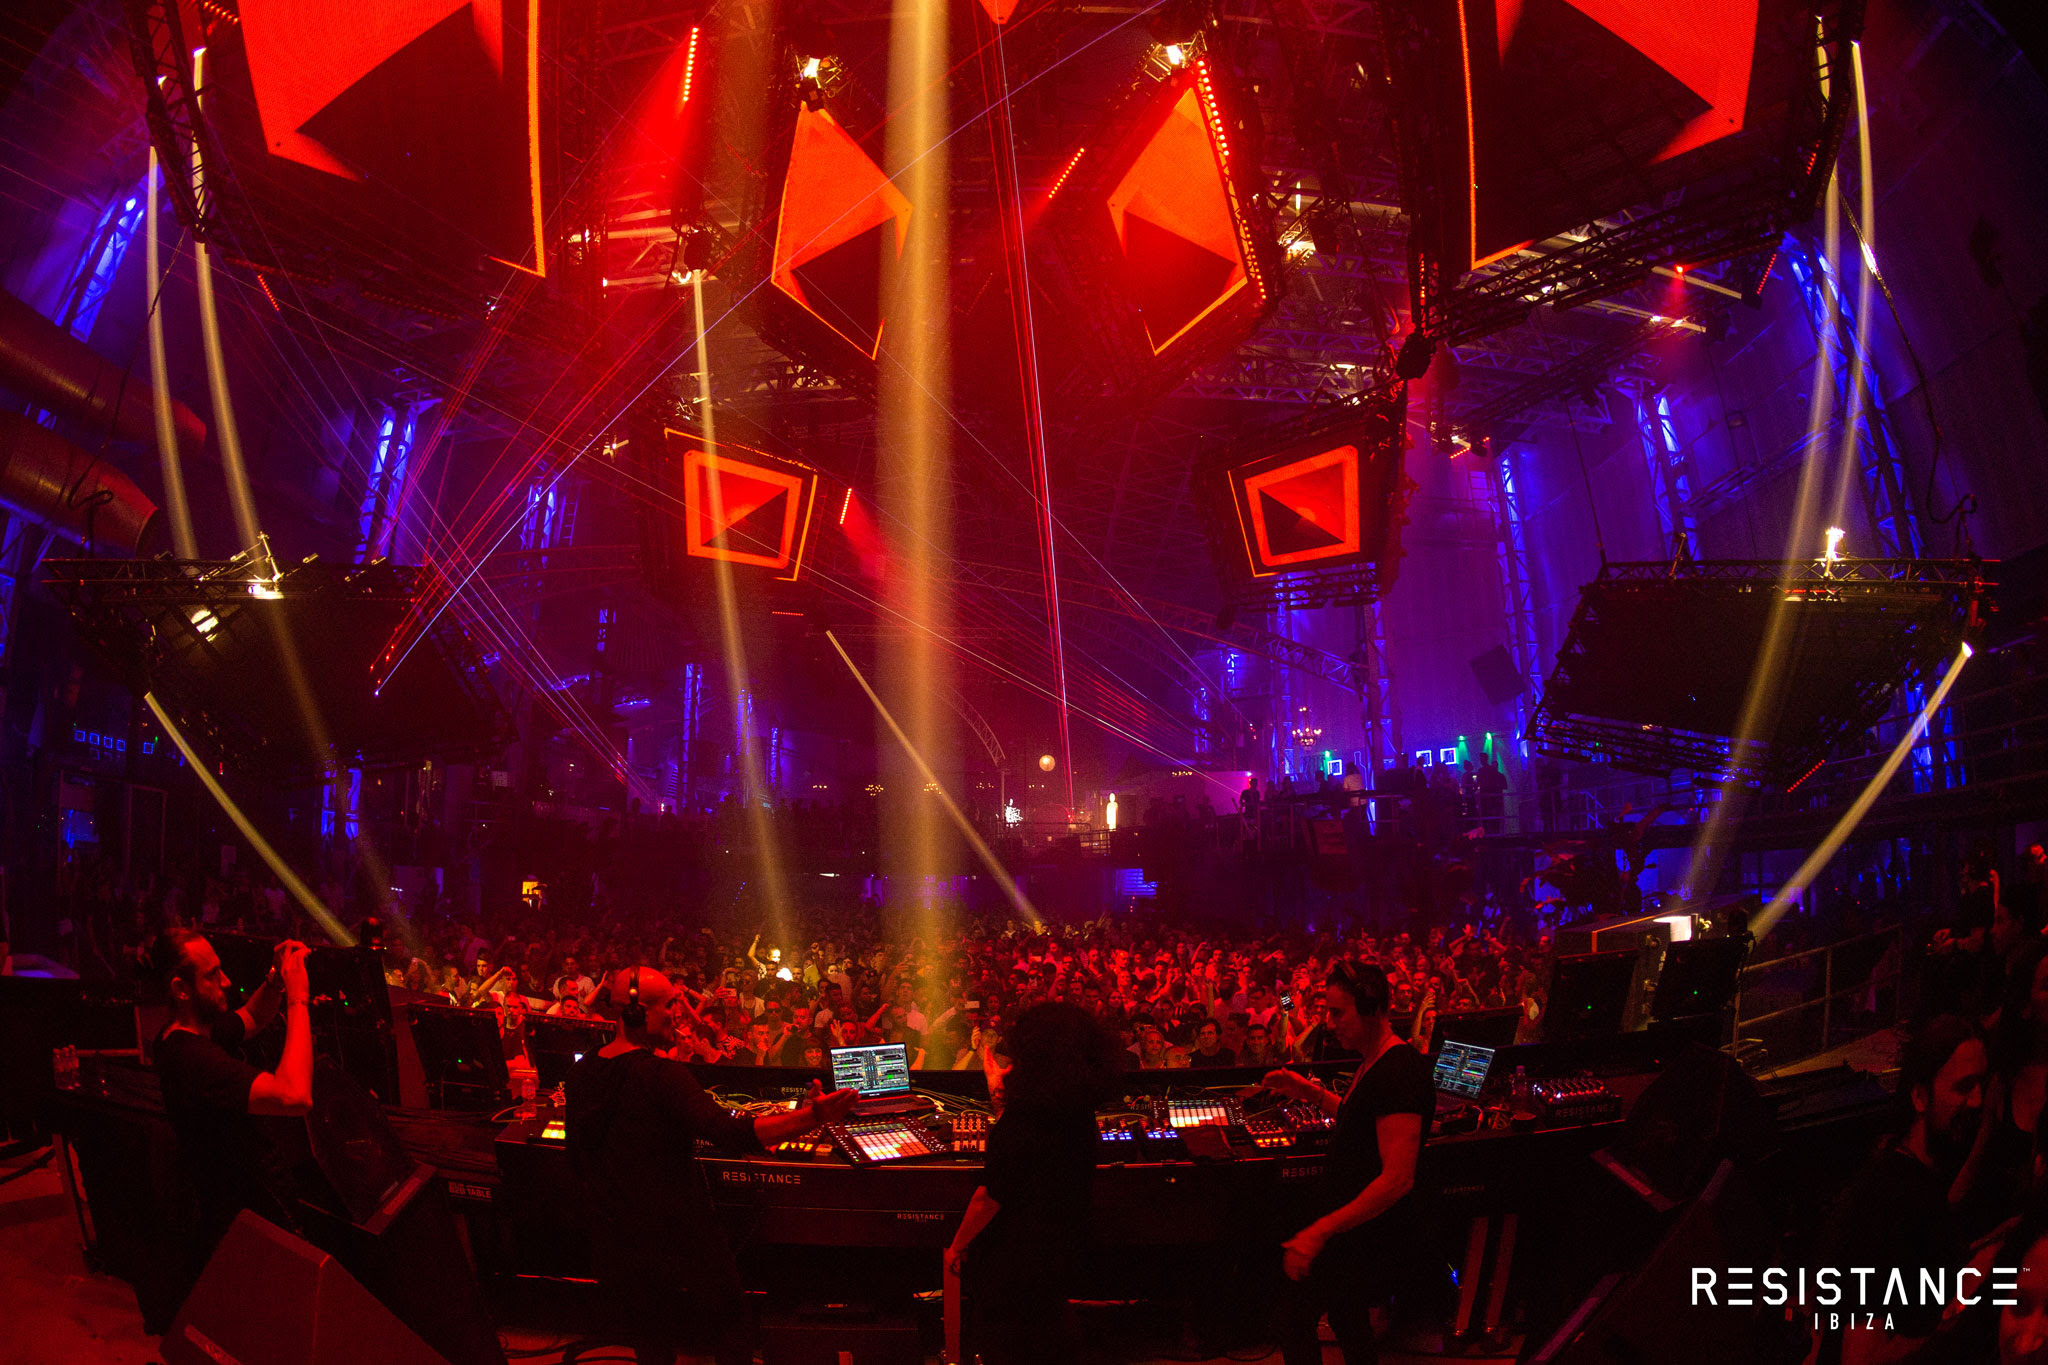 Resistance Ibiza Drops 2019 Season Headliners